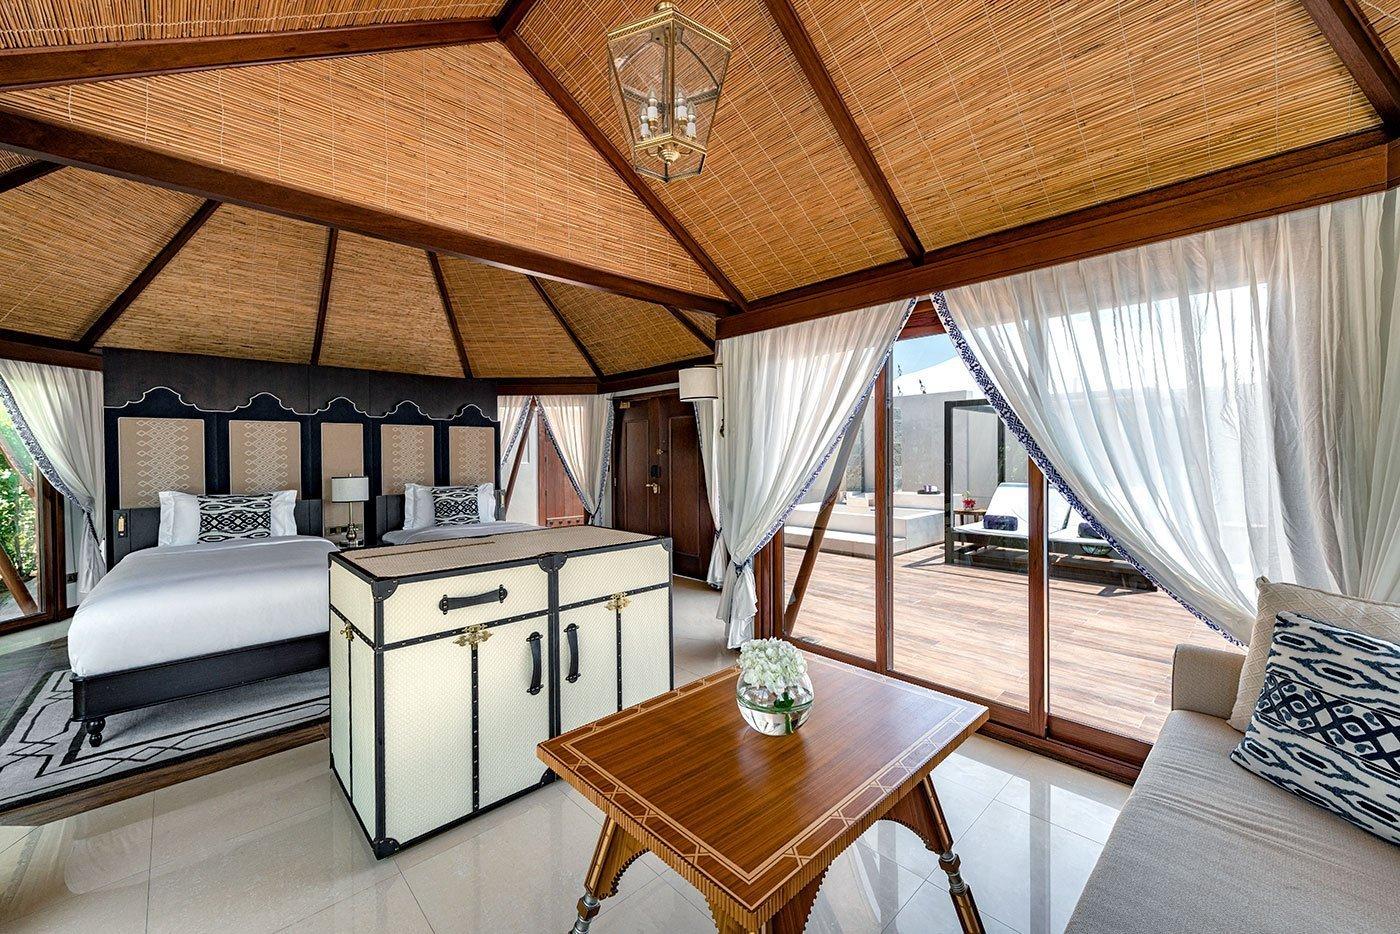 interior of a twin bed tent room at ritz carlton al hamra beach